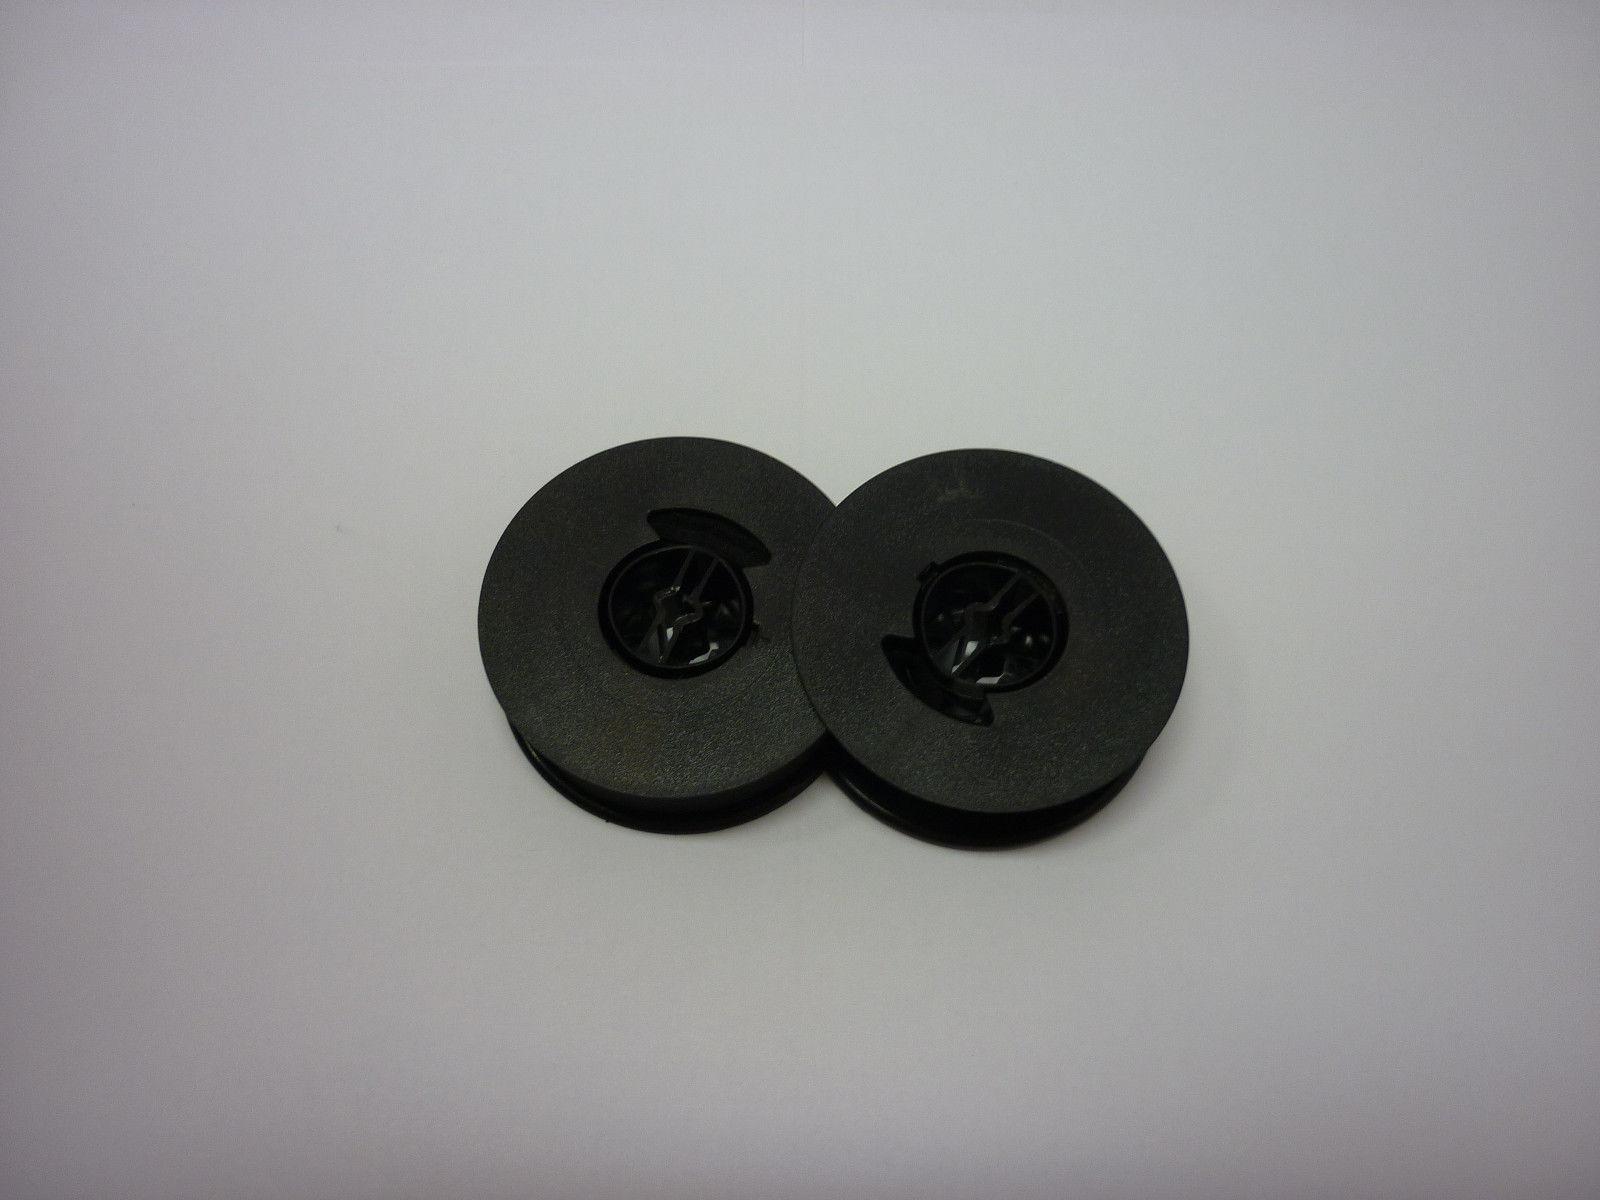 Brother Echelon 77 Echelon 44 Typewriter Ribbon Black Twin Spool